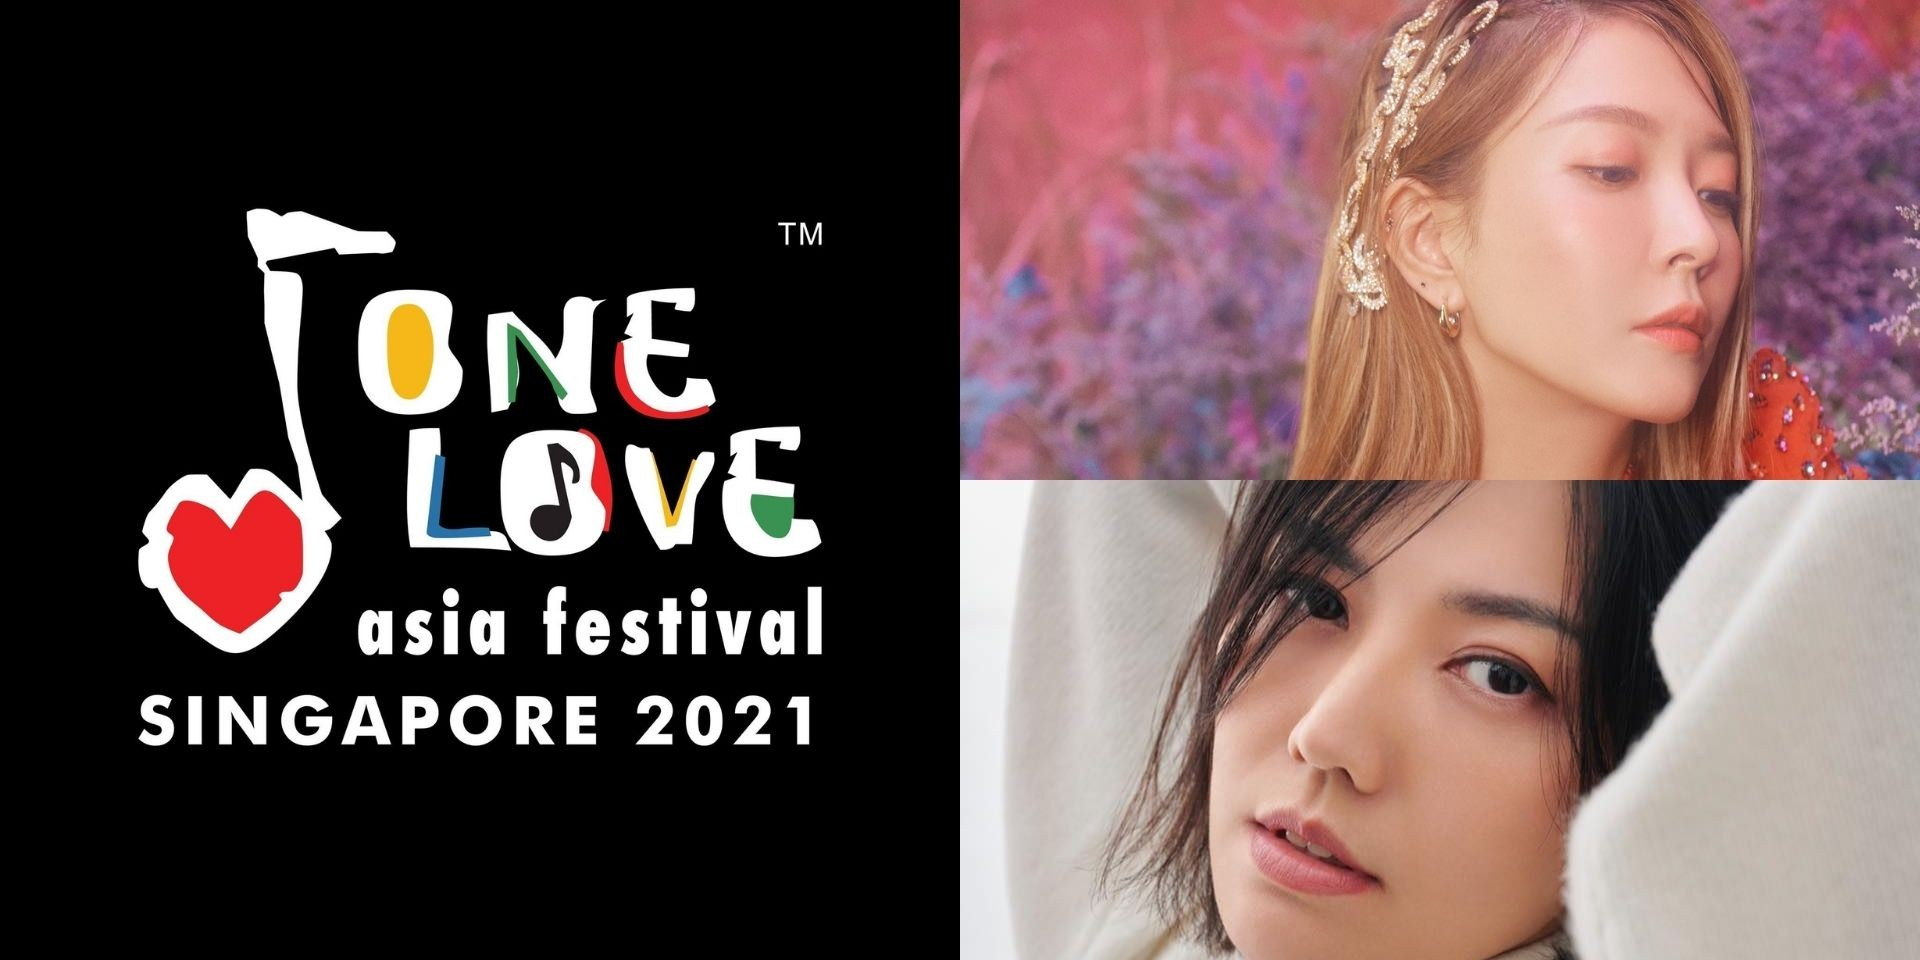 One Love Asia Festival 2021 featuring Stefanie Sun and BoA announces cancellation